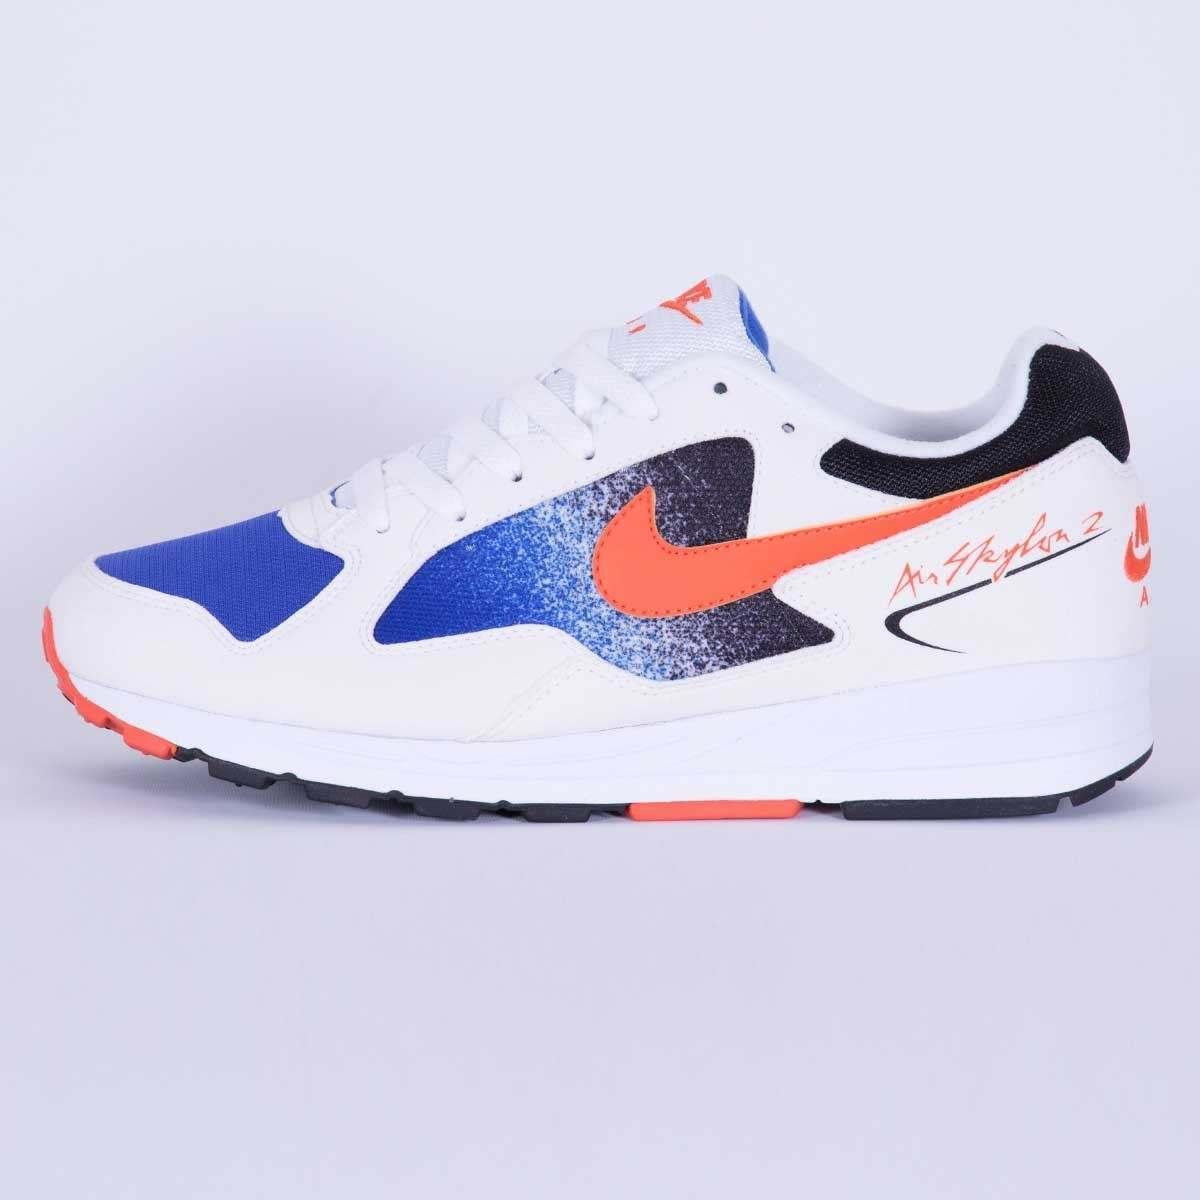 6caddfdb Мужские кроссовки Nike Air Skylon II AO1551-108 - Интернет-магазин